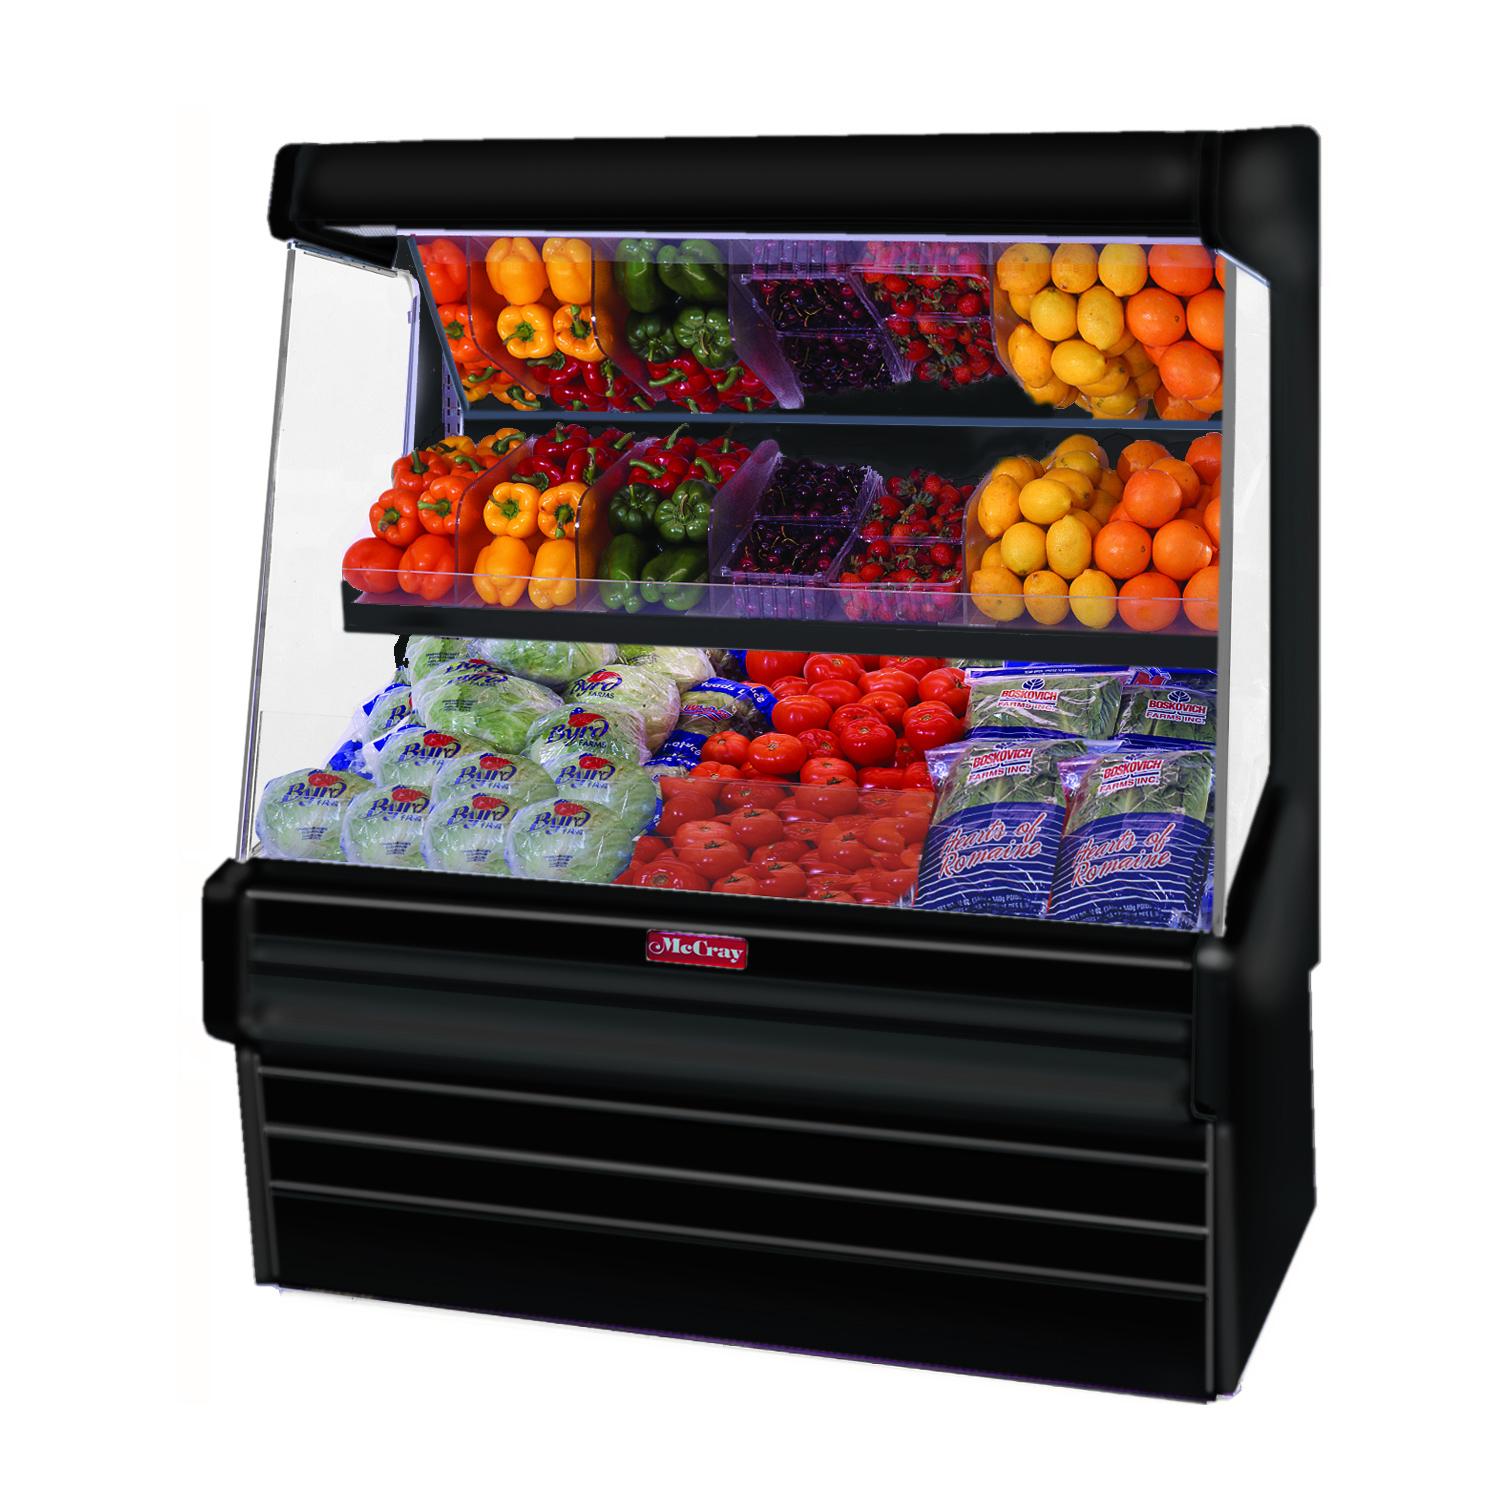 Howard-McCray SC-OP30E-6L-B-LED display case, produce